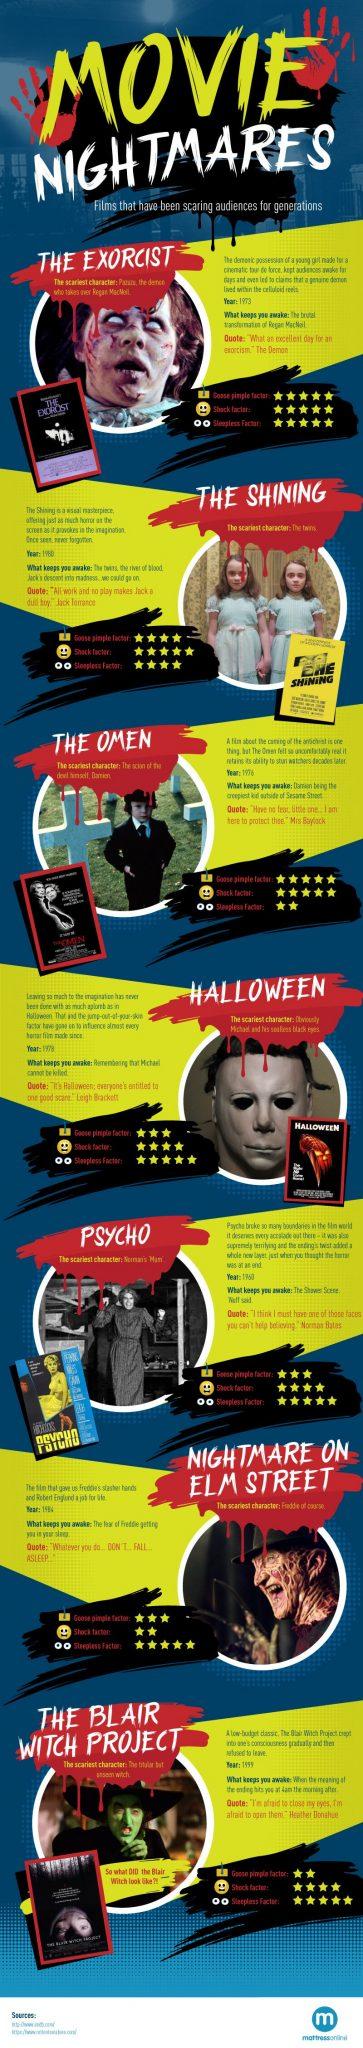 Did You Have Movie Nightmares?